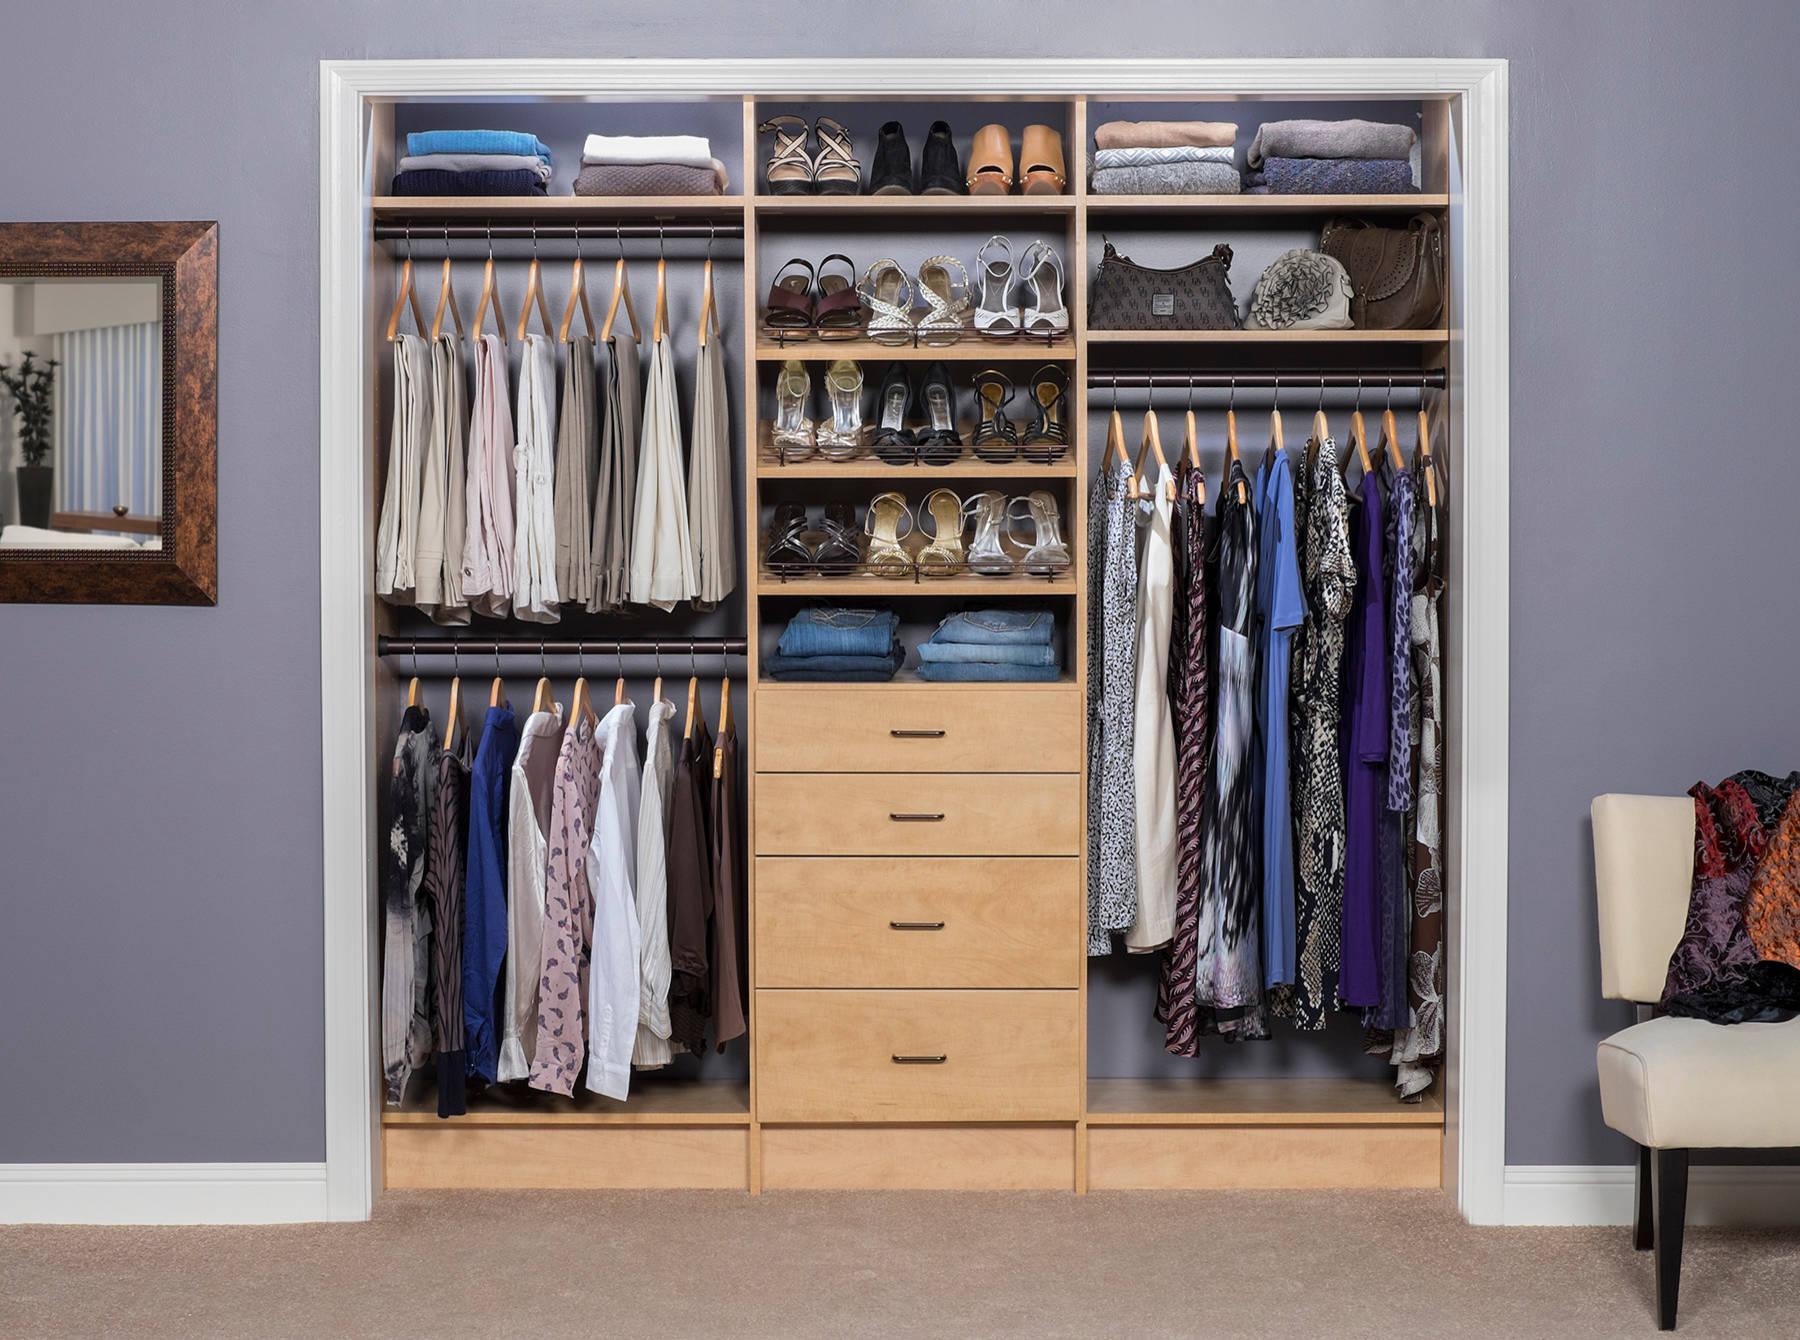 reach in closet pictures ideas